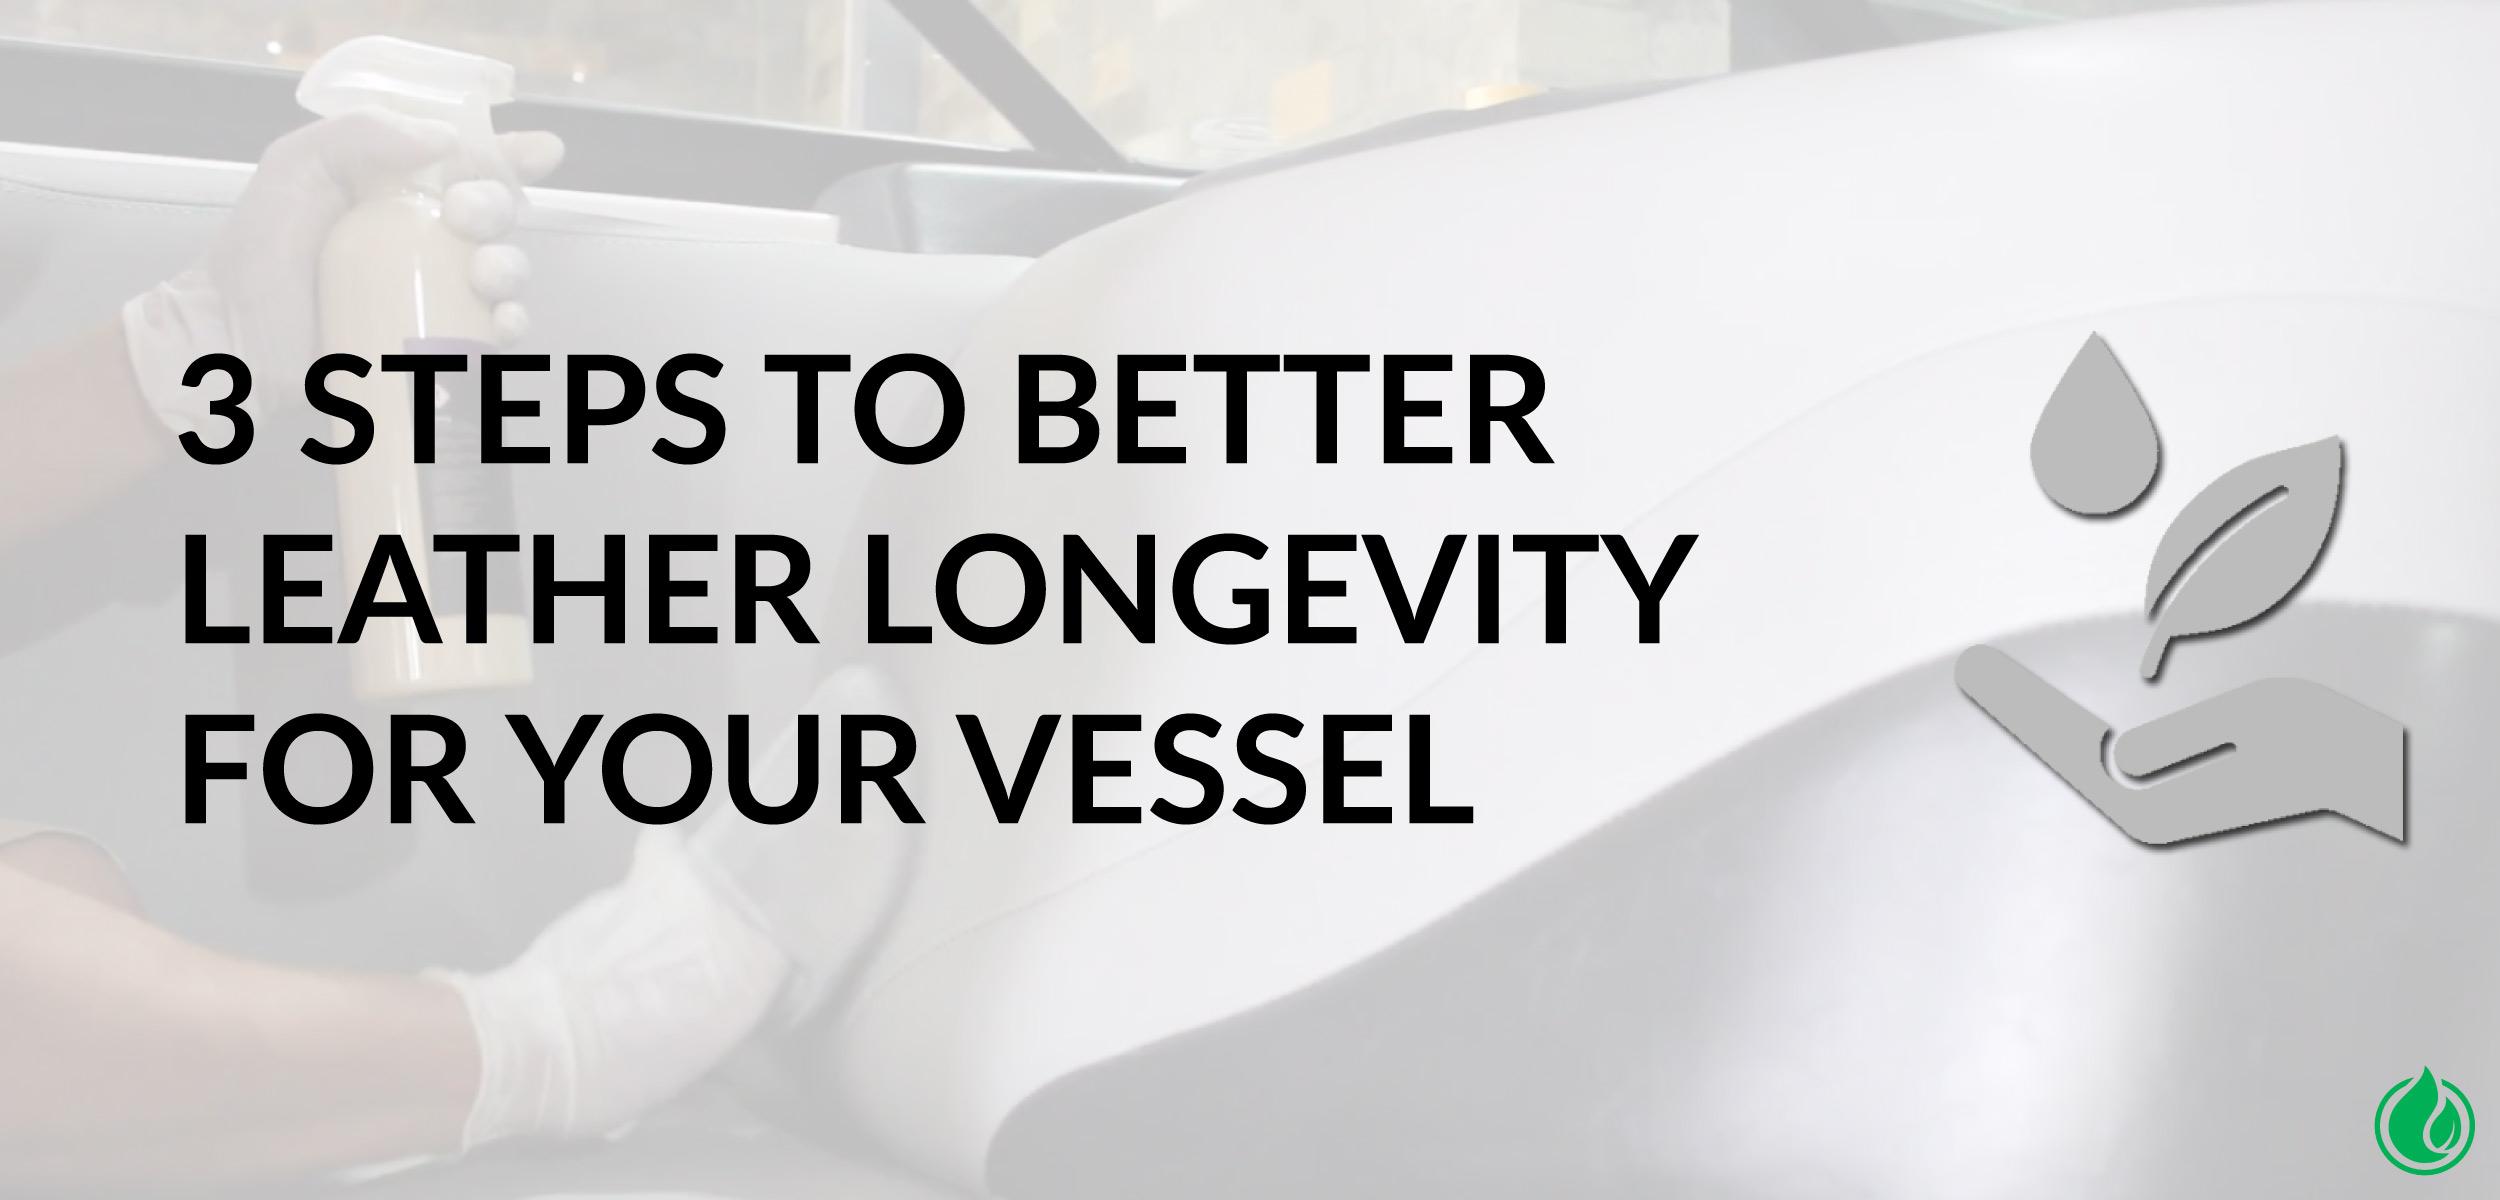 3-STEPS-TO-BETTER-LEATHER-LONGEVITY-ON-VESSEL-BOAT-YACHT-PONTOON